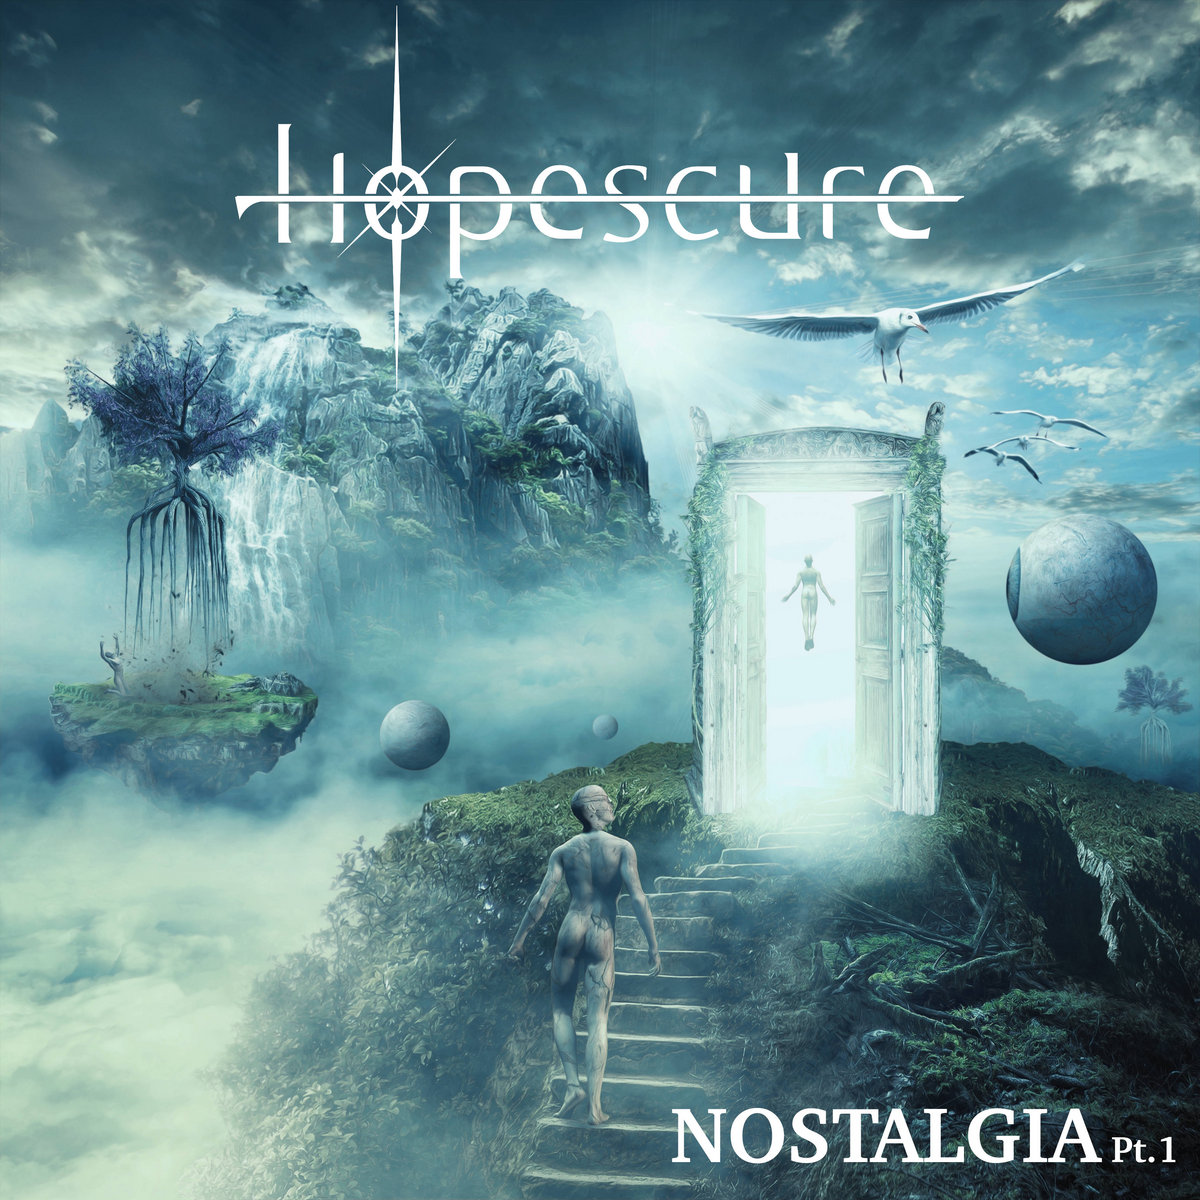 Hopescure: Nostalgia pt. I